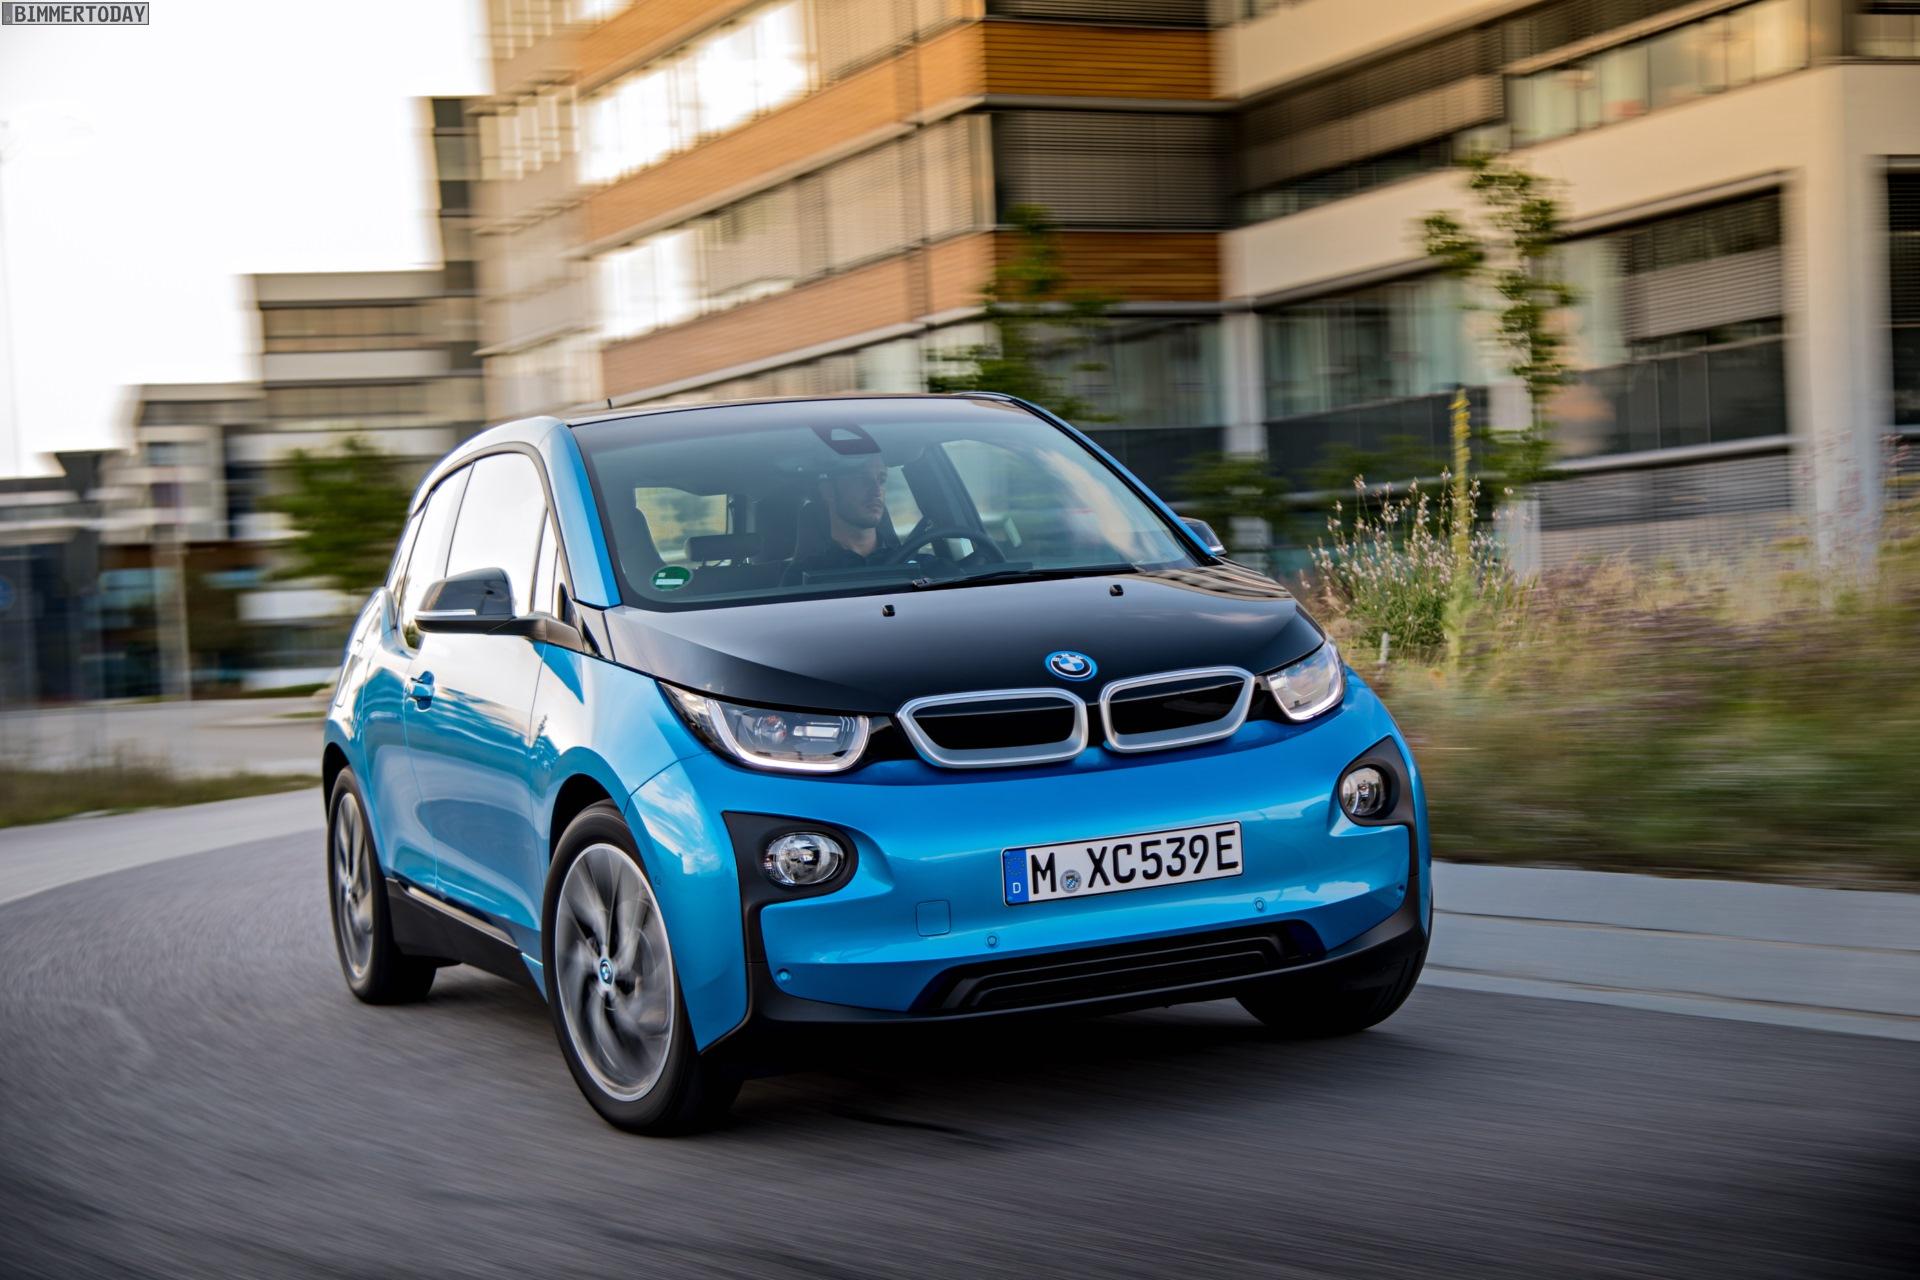 2016 BMW i3 94Ah Protonic Blue 33 kWh Elektroauto 01